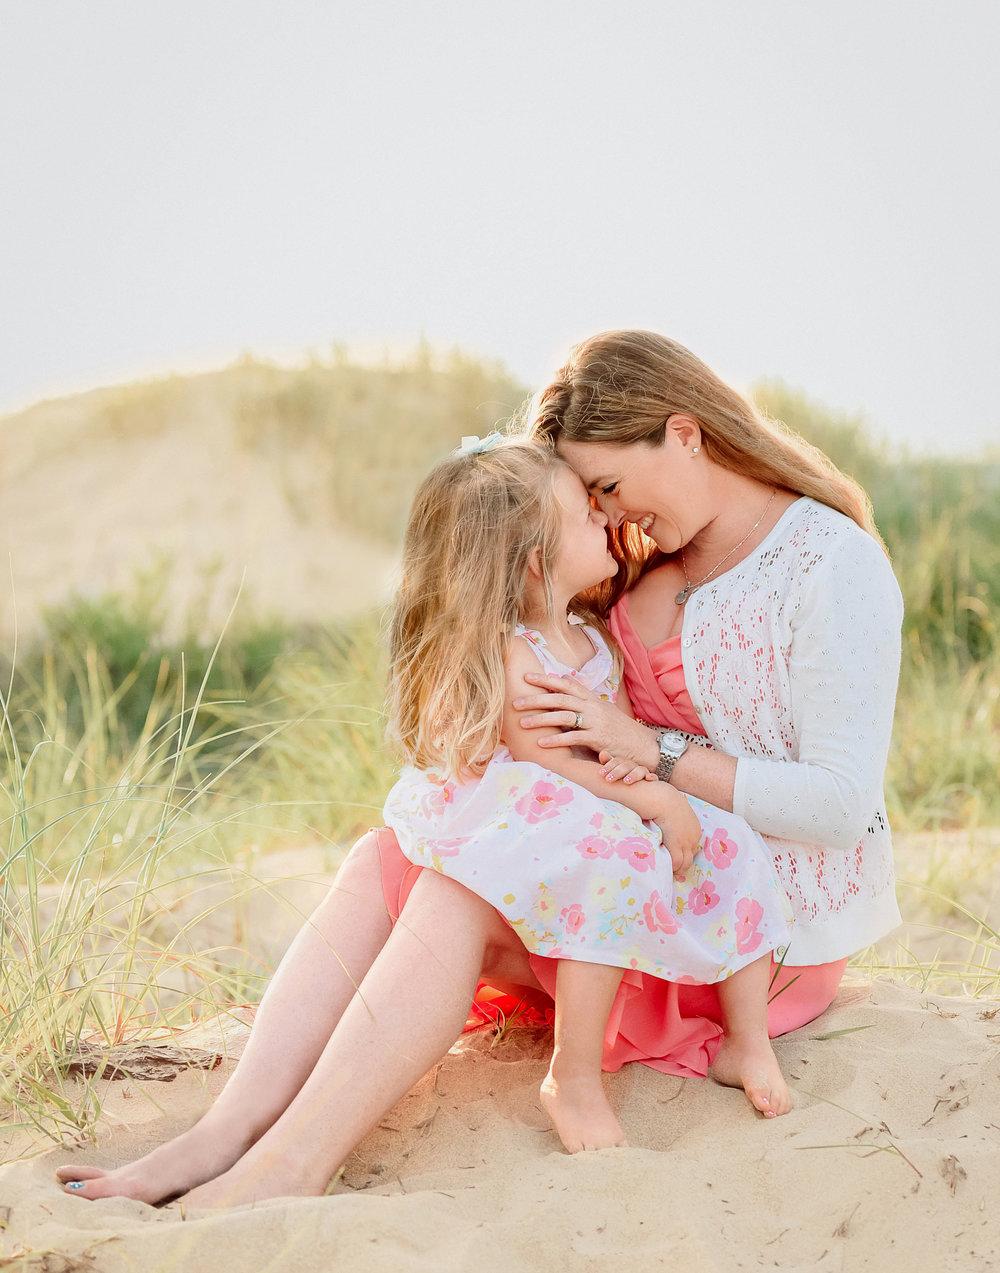 family-beach-session-tips-virginia-beach-family-lifestyle-photographer-melissa-bliss-photography-sandbridge-photo-session.jpg